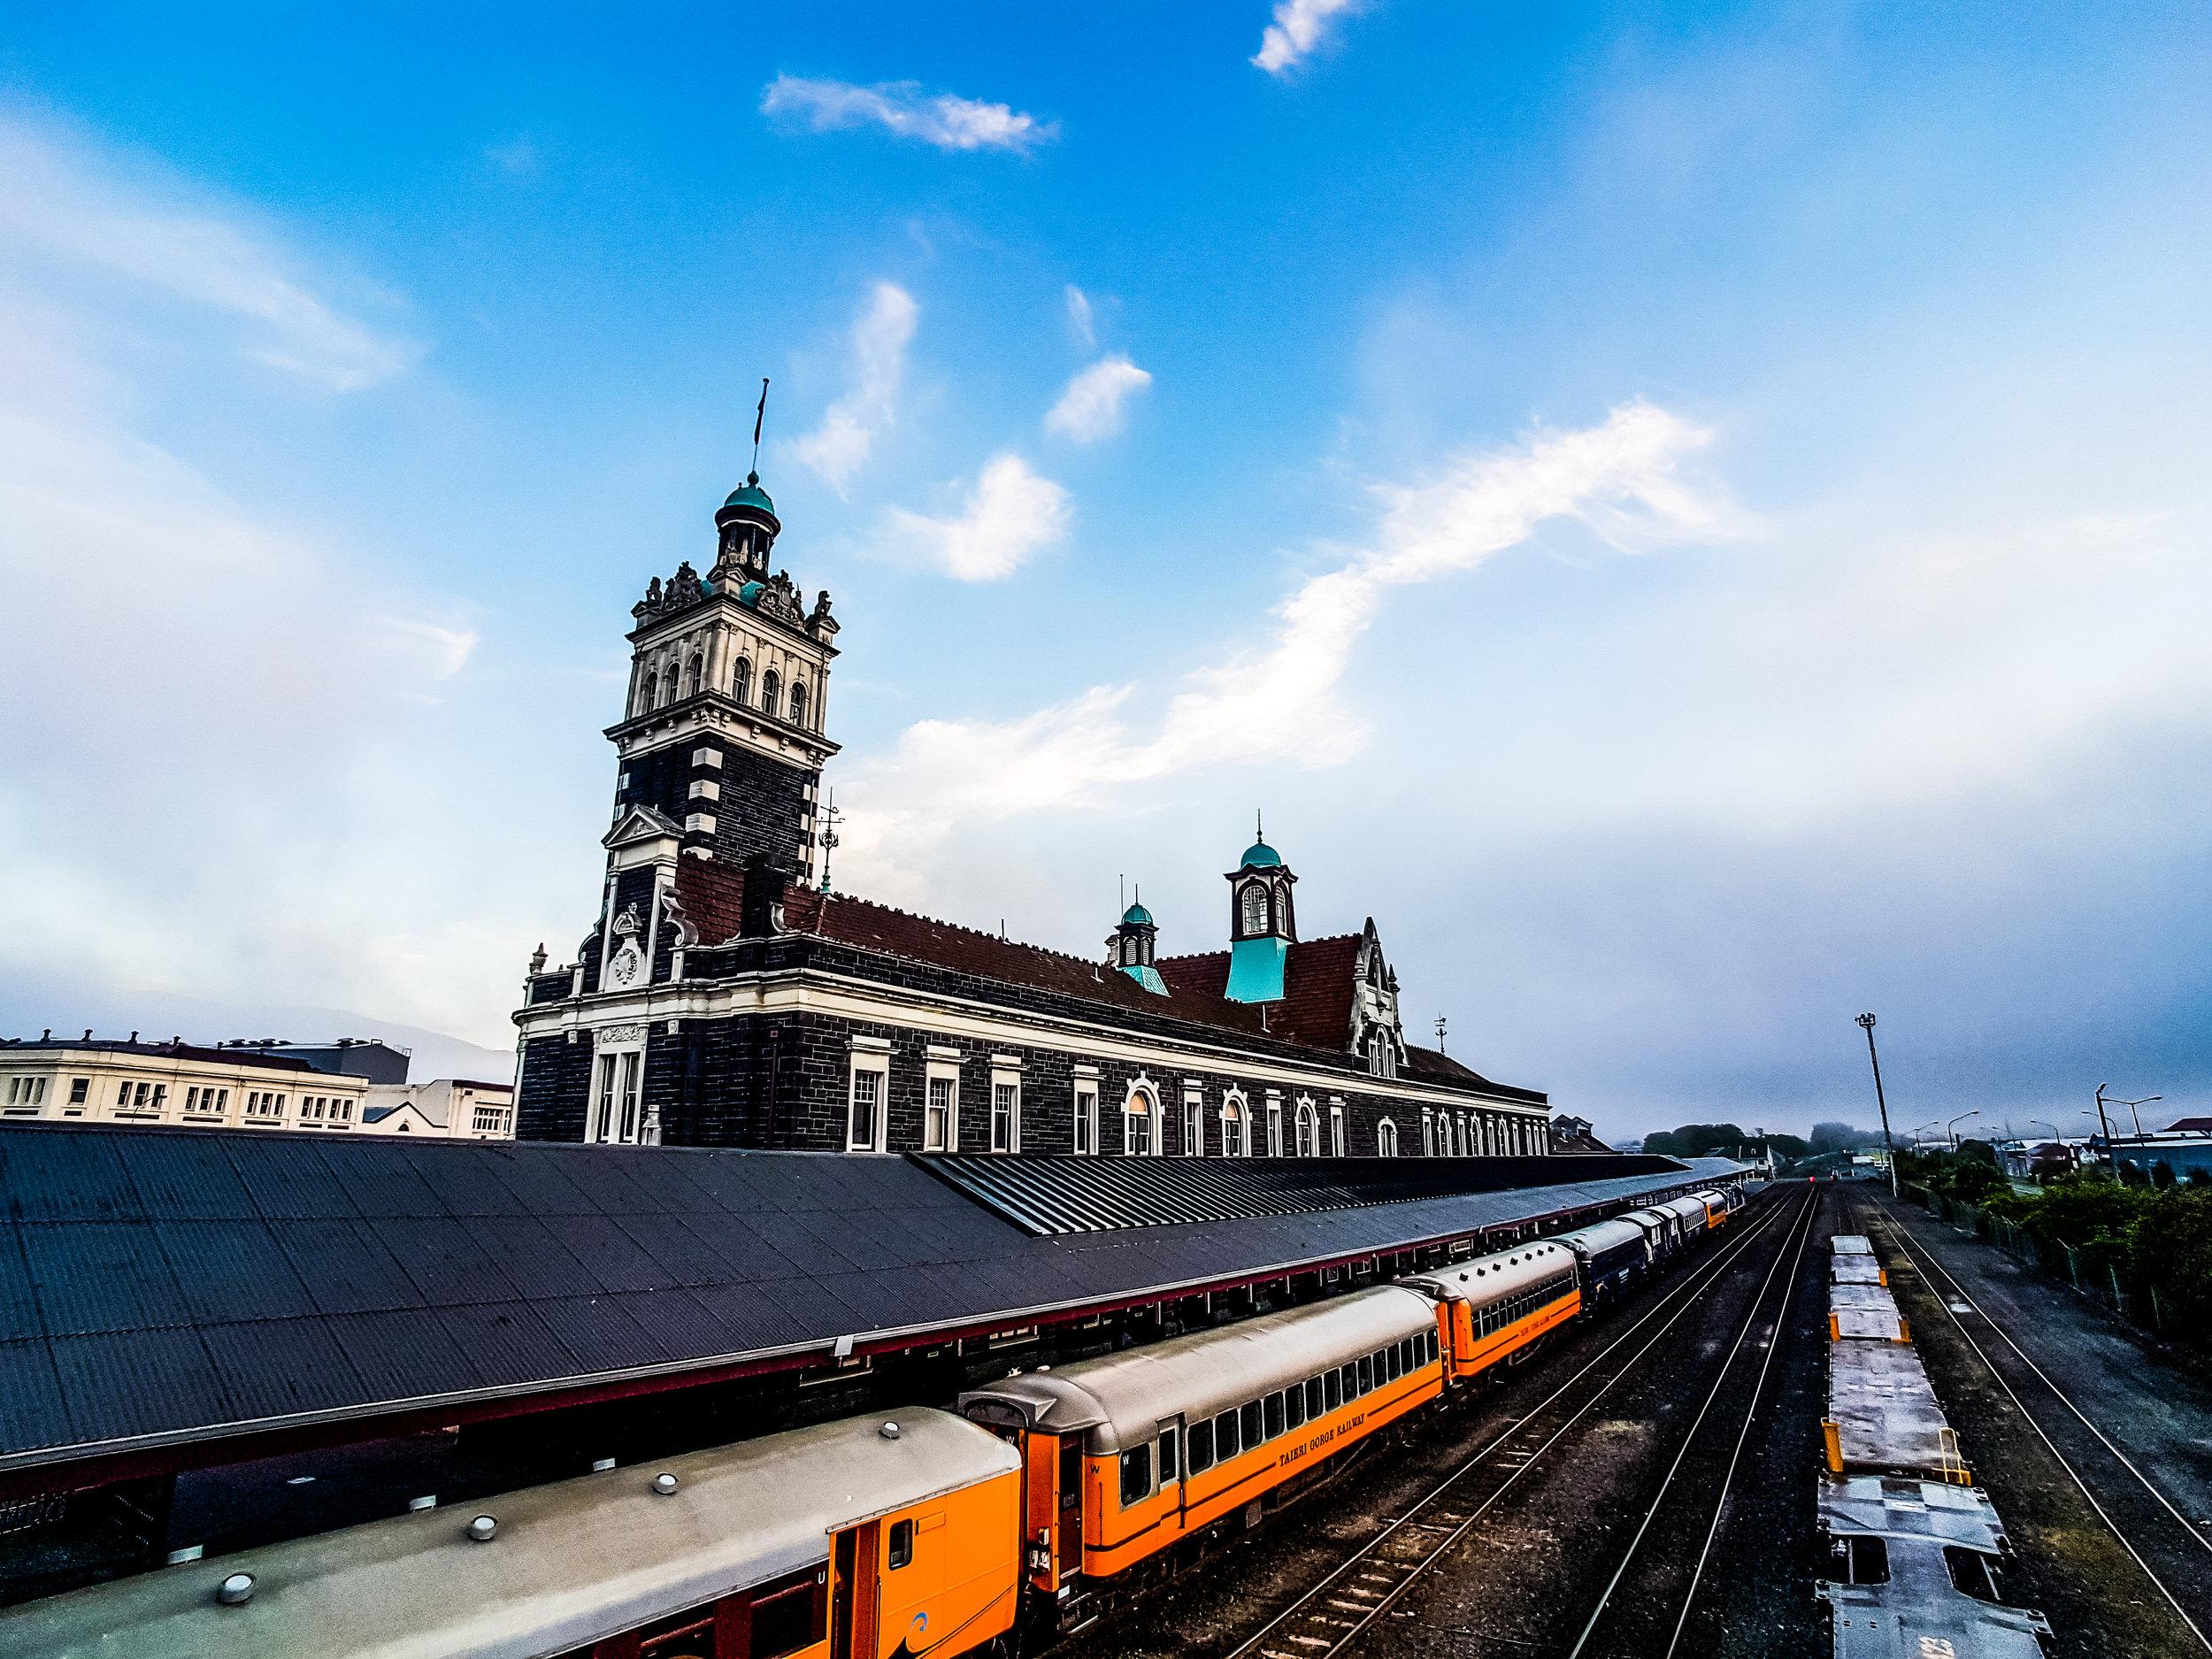 43.  Along the tracks - Dunedin Railway Station 20171030.jpg